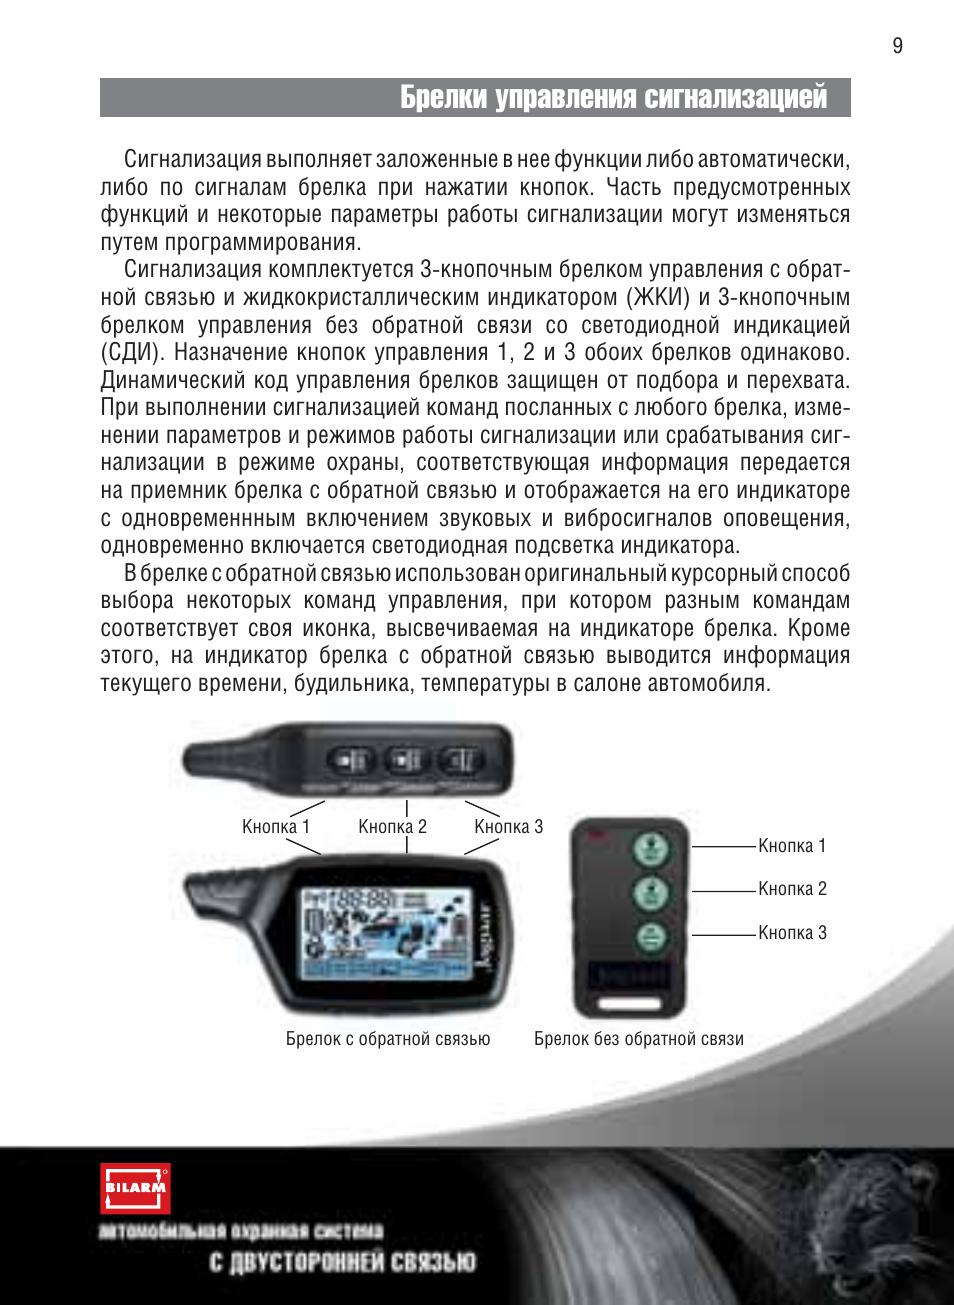 инструкция по настройке брелка сигнализации ягуар